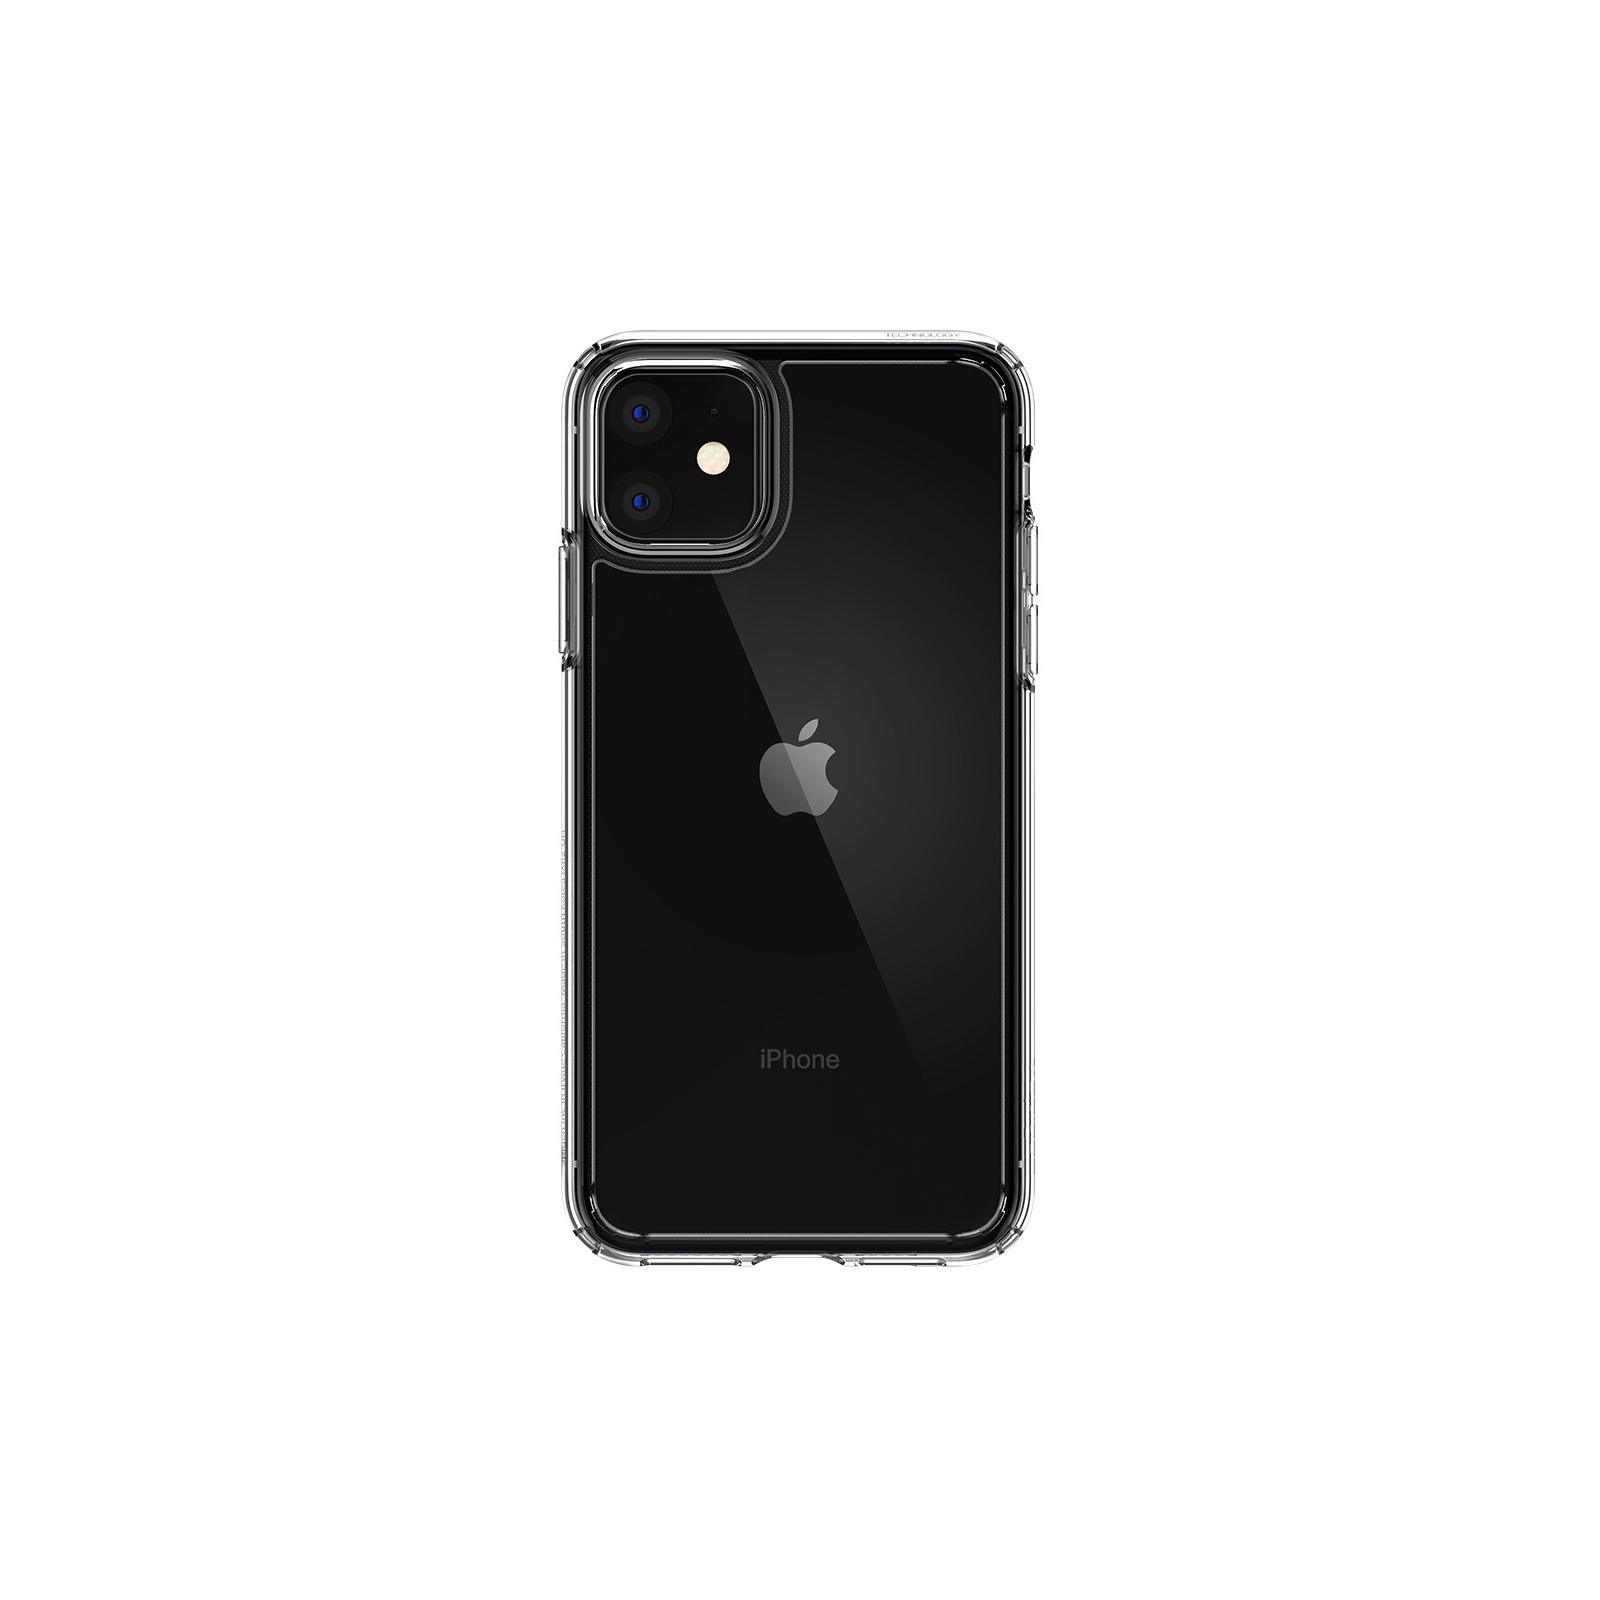 Чехол для моб. телефона Spigen iPhone 11 Crystal Hybrid, Crystal Clear (076CS27086)